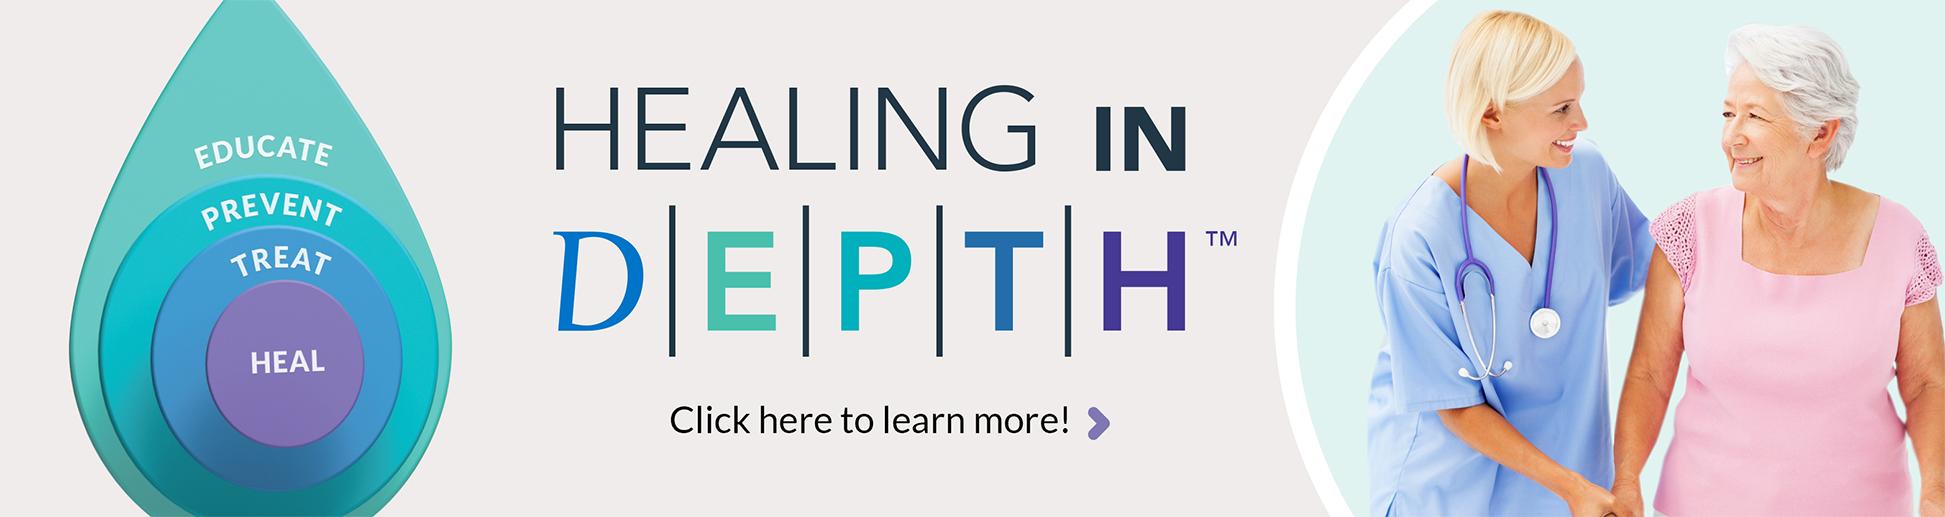 Healing in D.E.P.T.H.